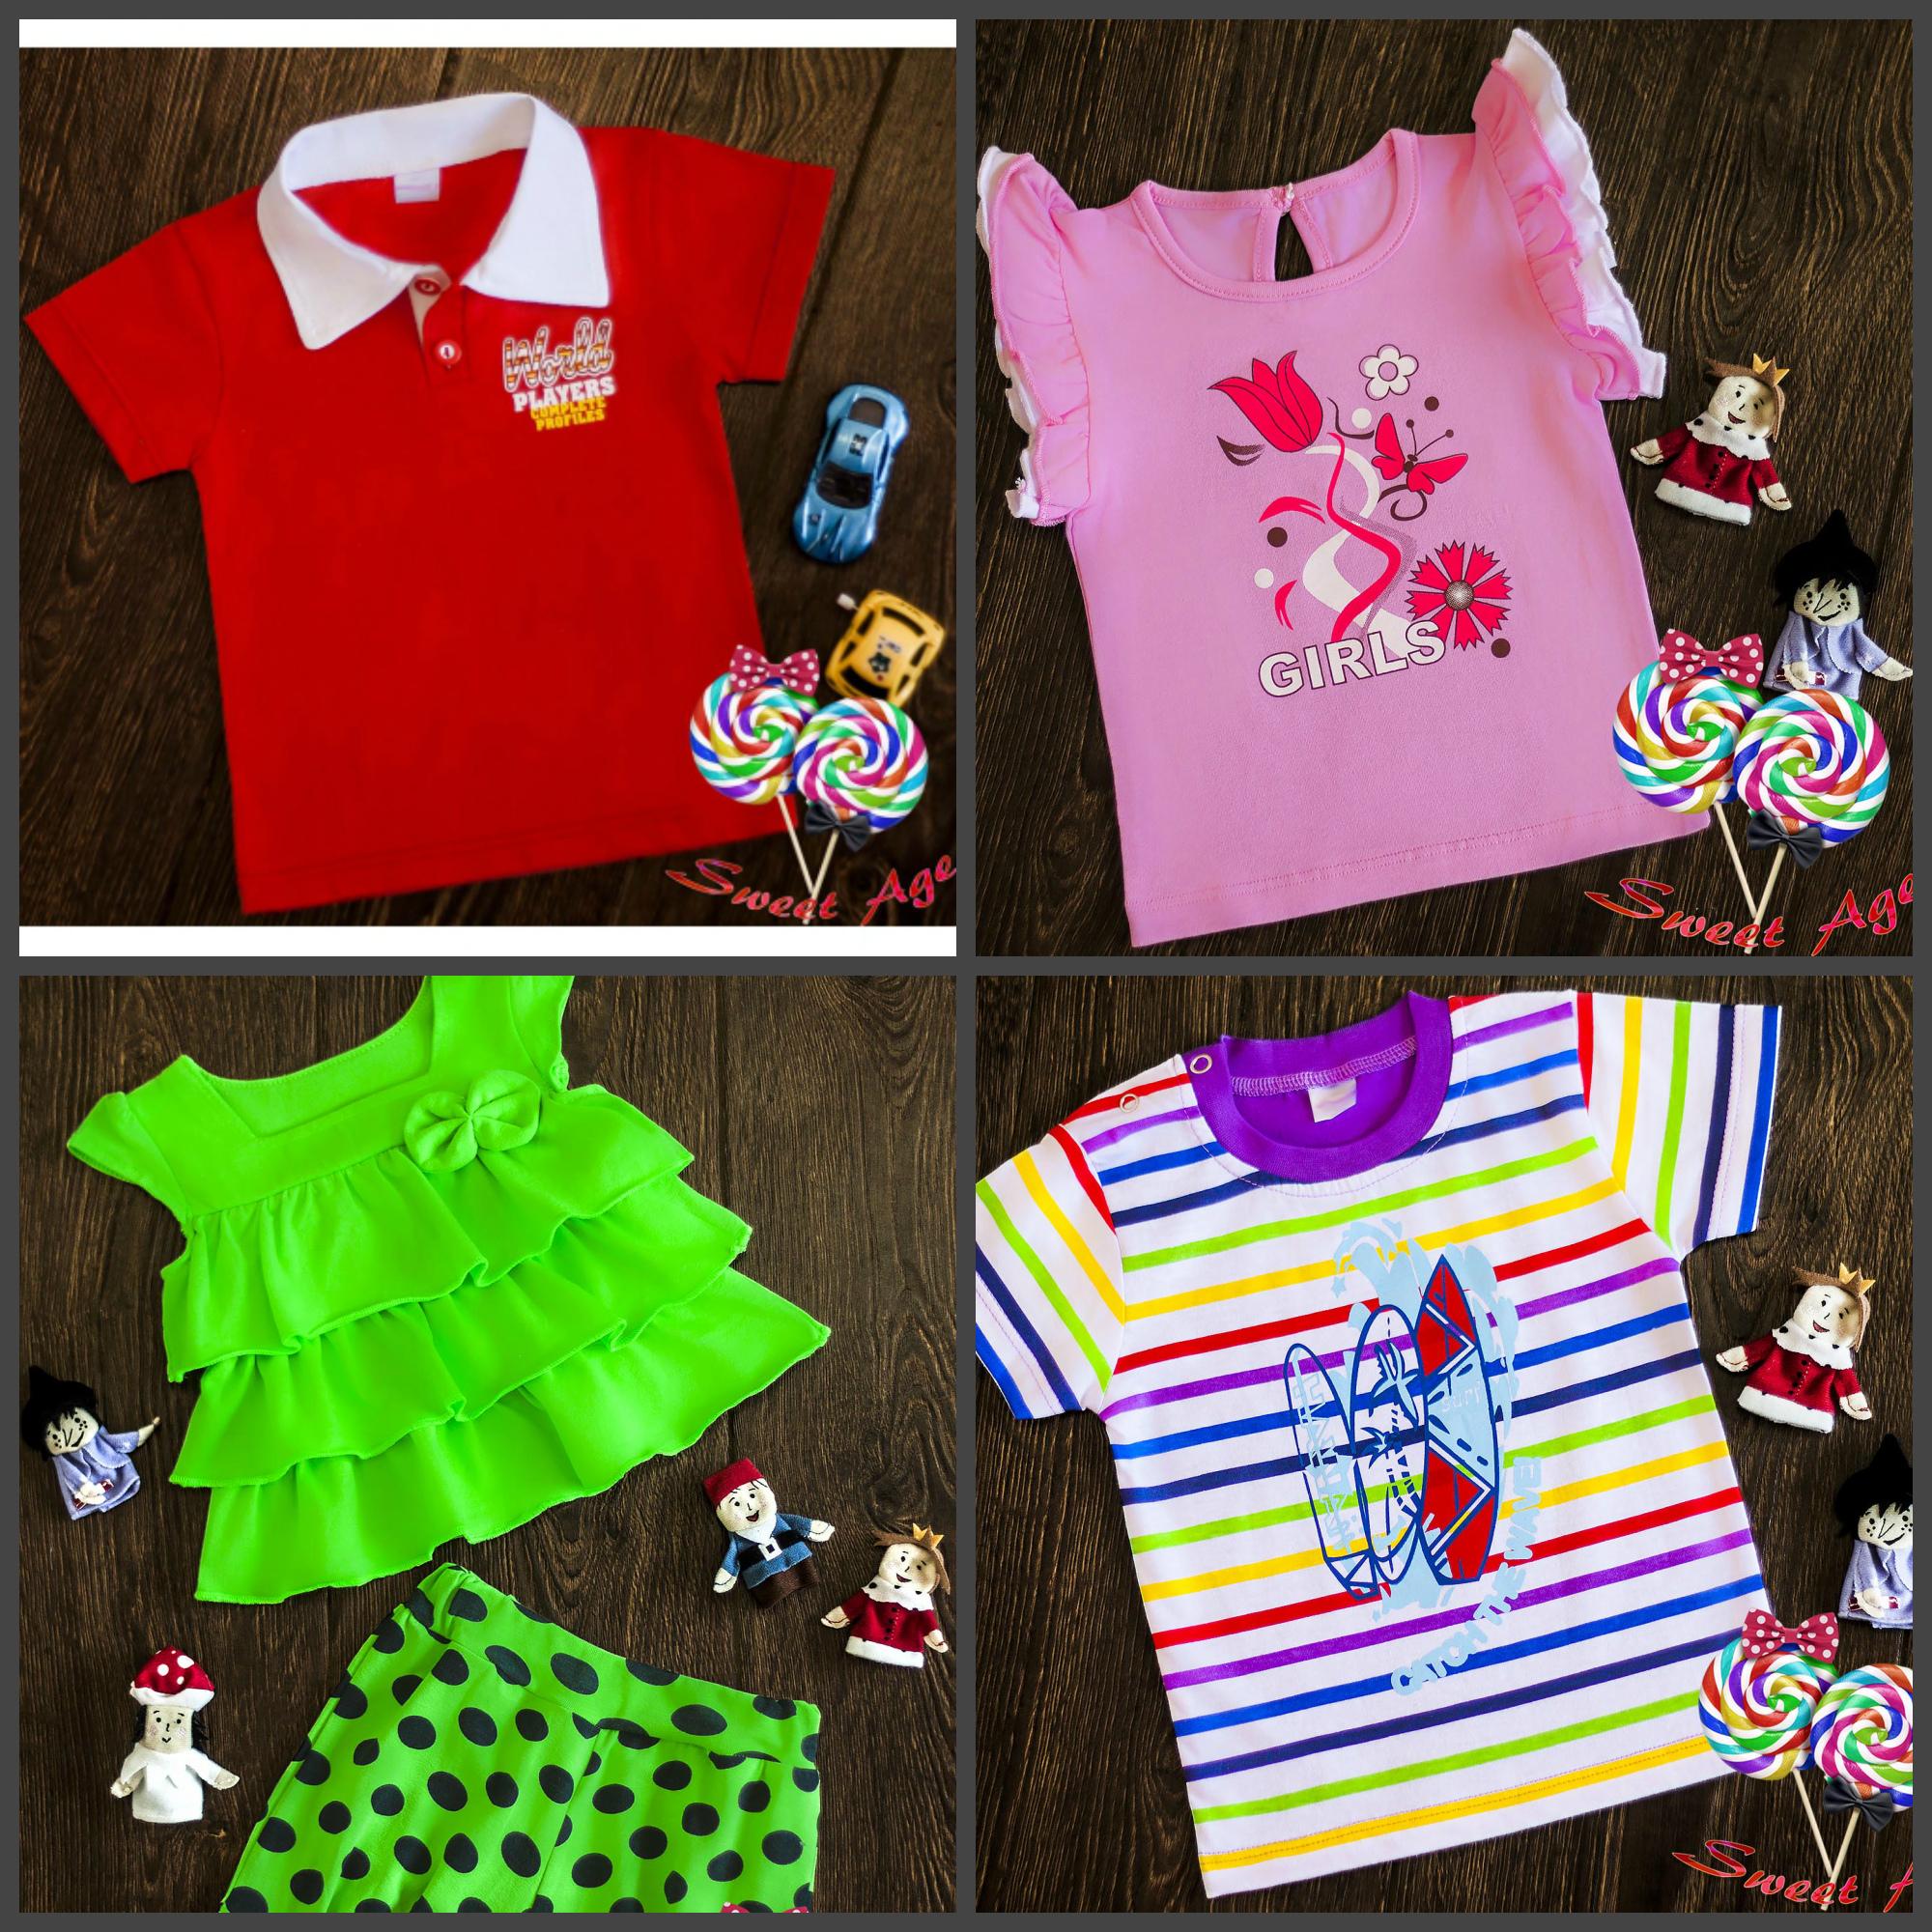 Sweet age - яркая и качественная одежда для детей (от 56 до 122 см) по низким ценам. Новинки. Без рядов!